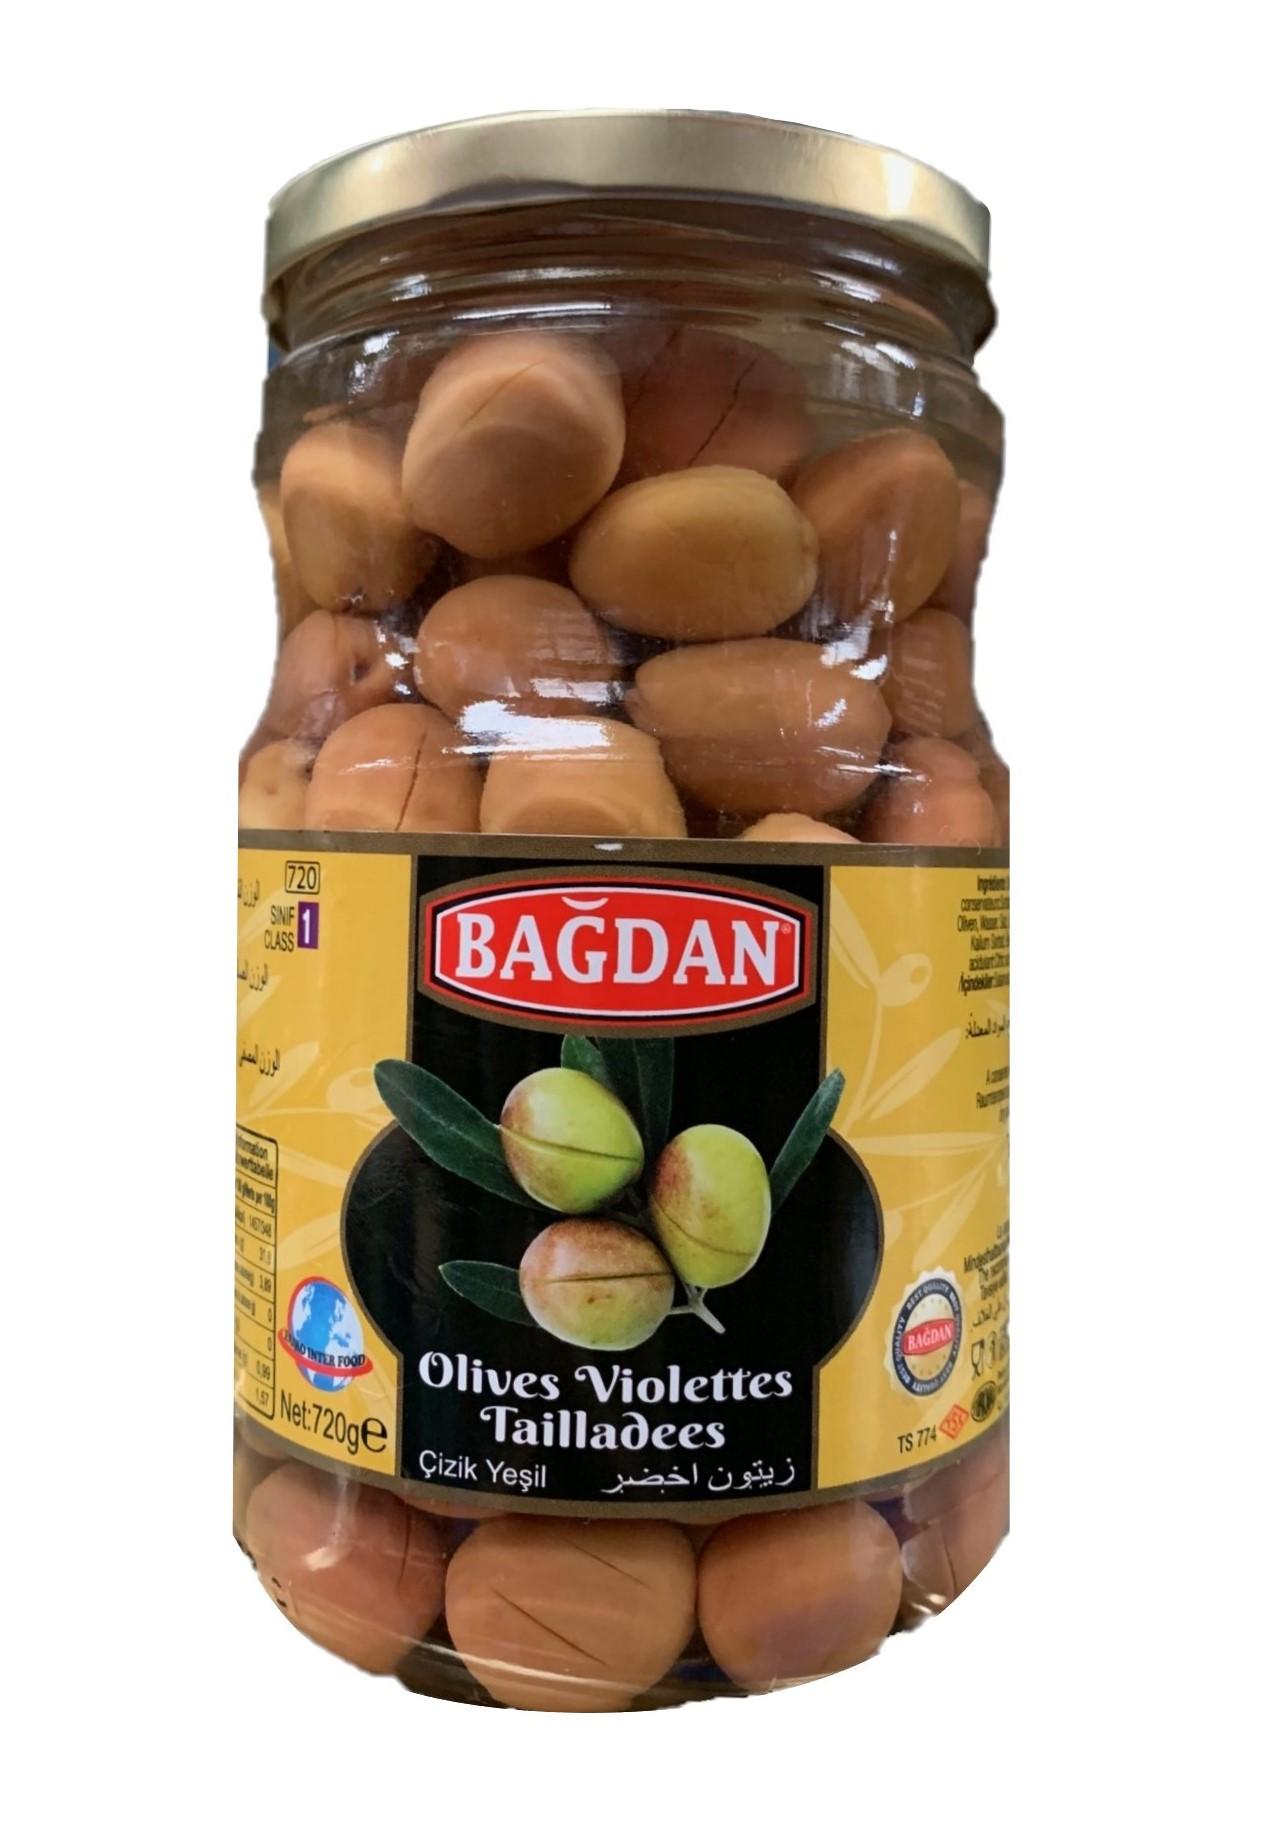 BAGDAN CAM YESIL ZEYTIN CIZIK  (olives vertes coupées)